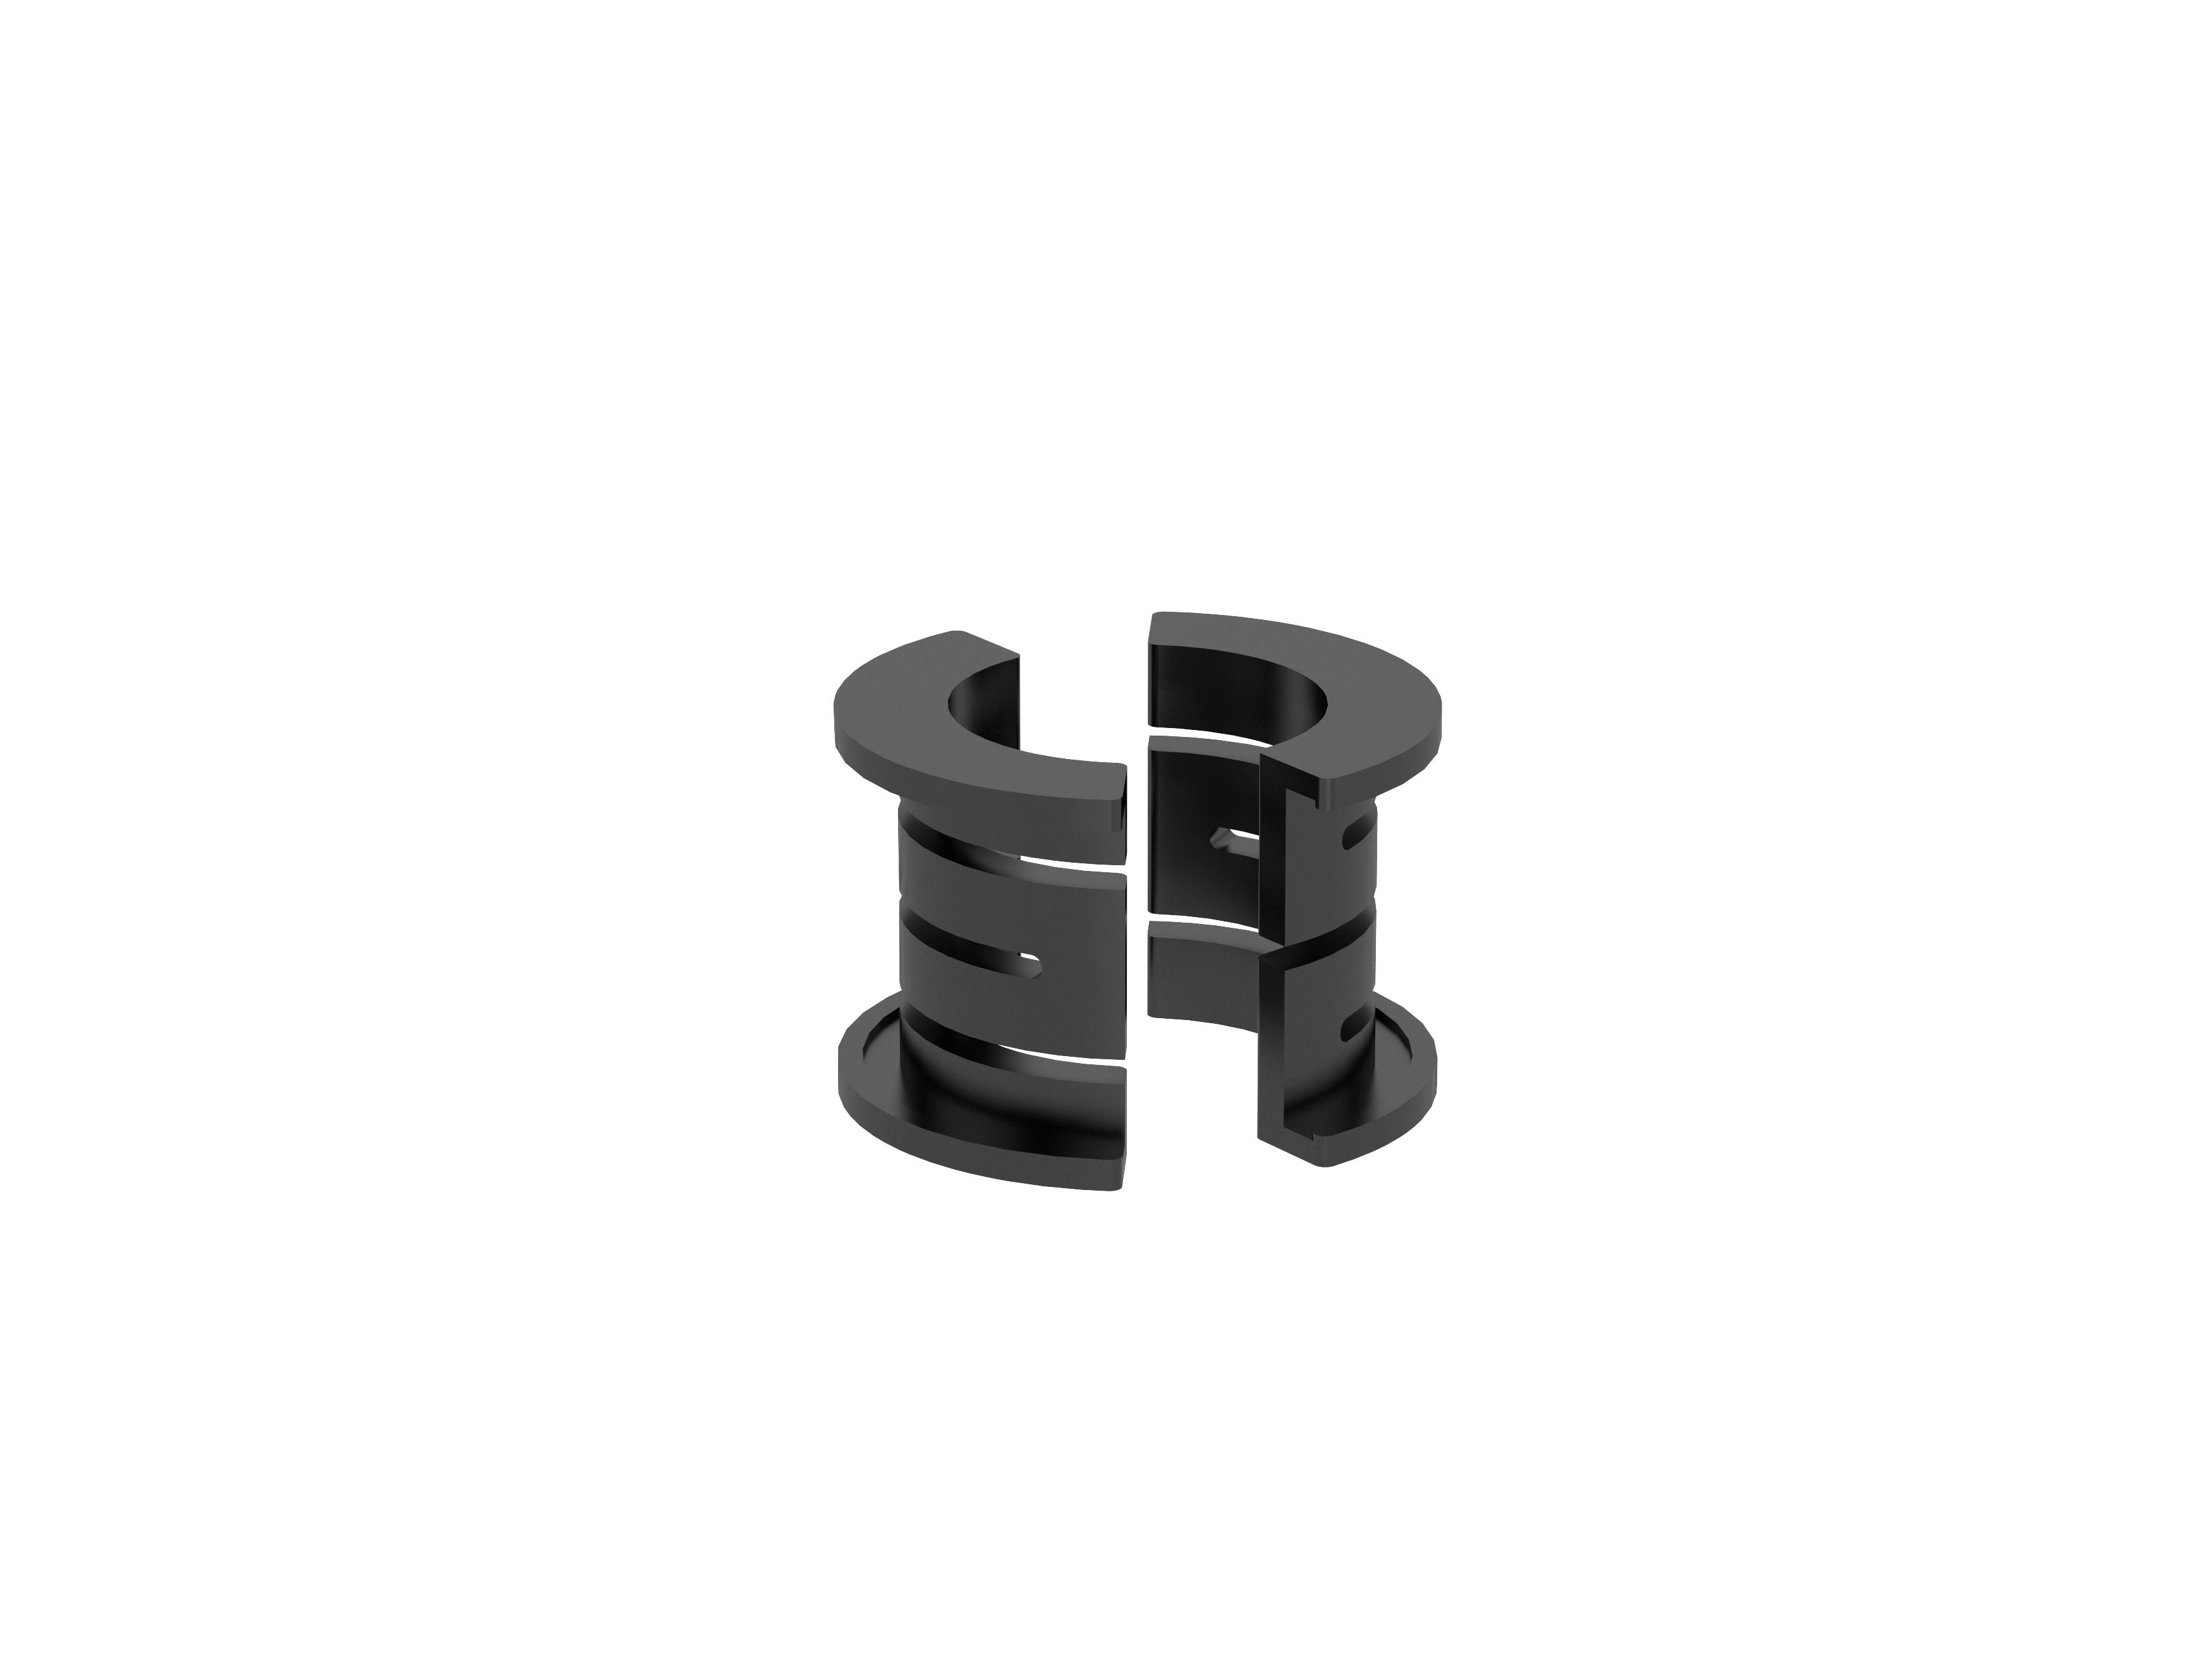 K5.0036605-cforce-mini-Clamp-Insert-2